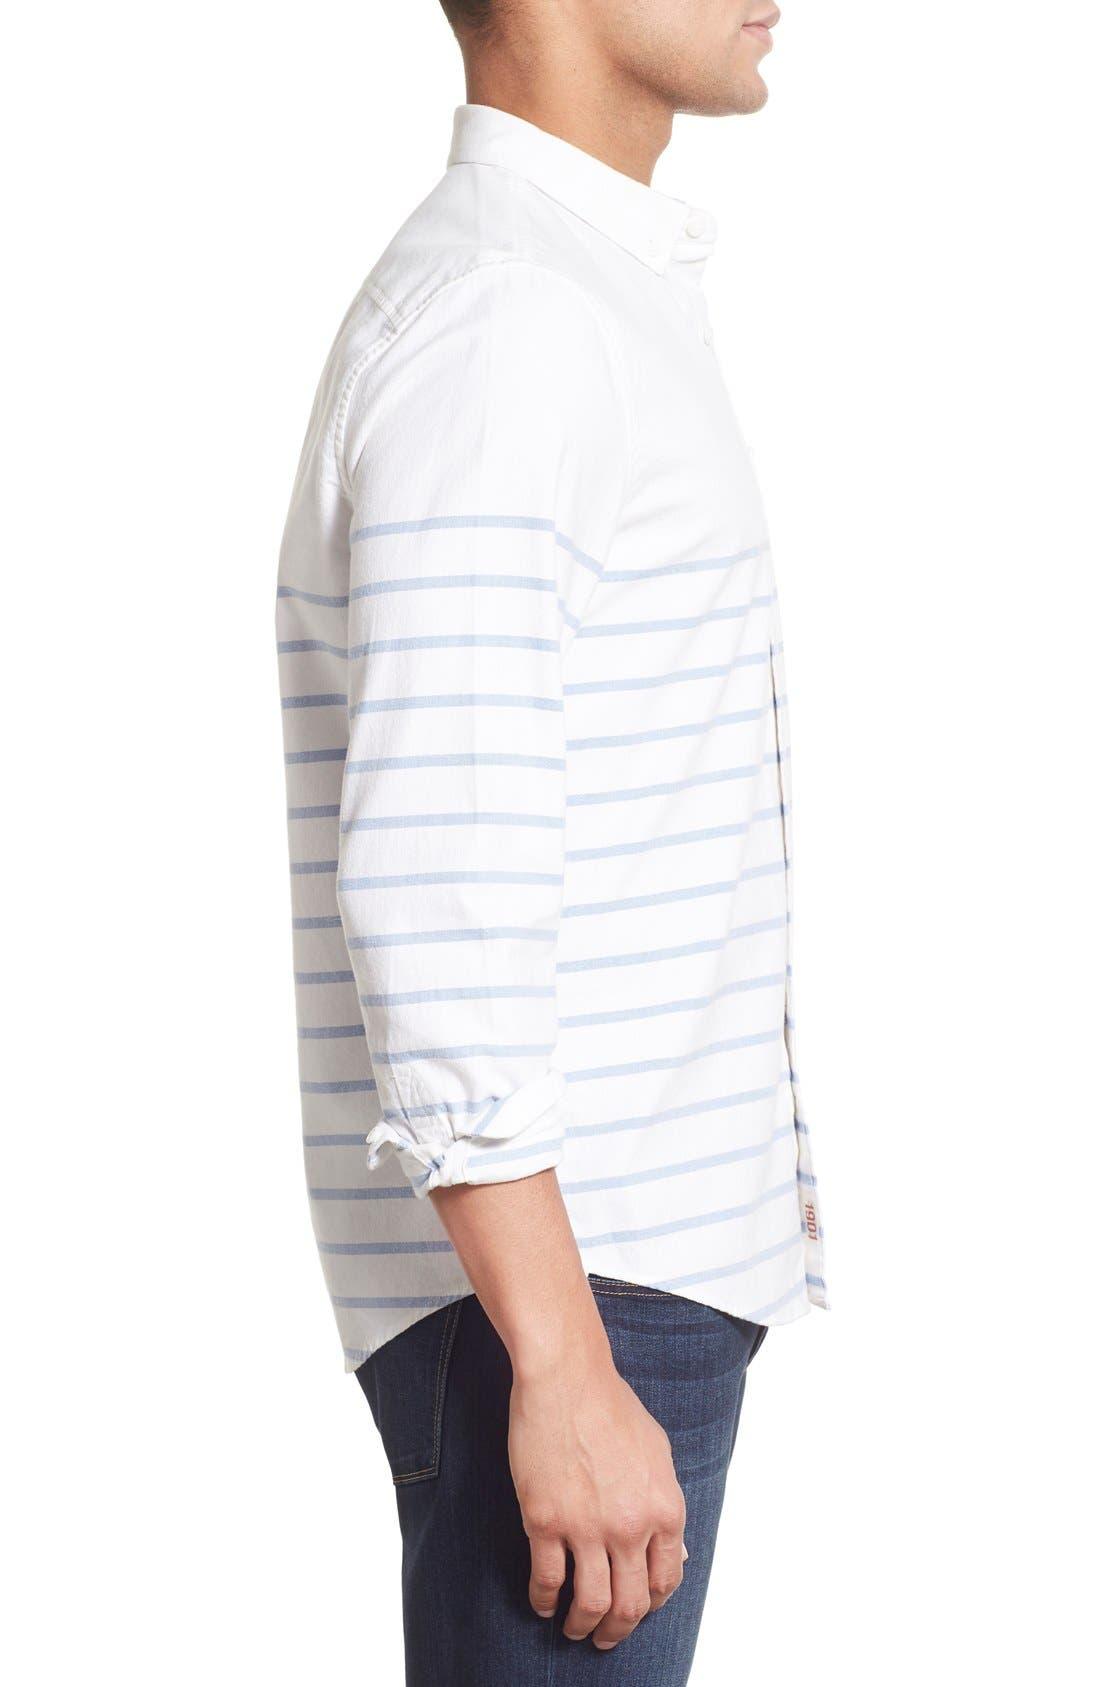 Alternate Image 3  - 1901 'La Conner' Trim Fit Stripe Print Woven Shirt